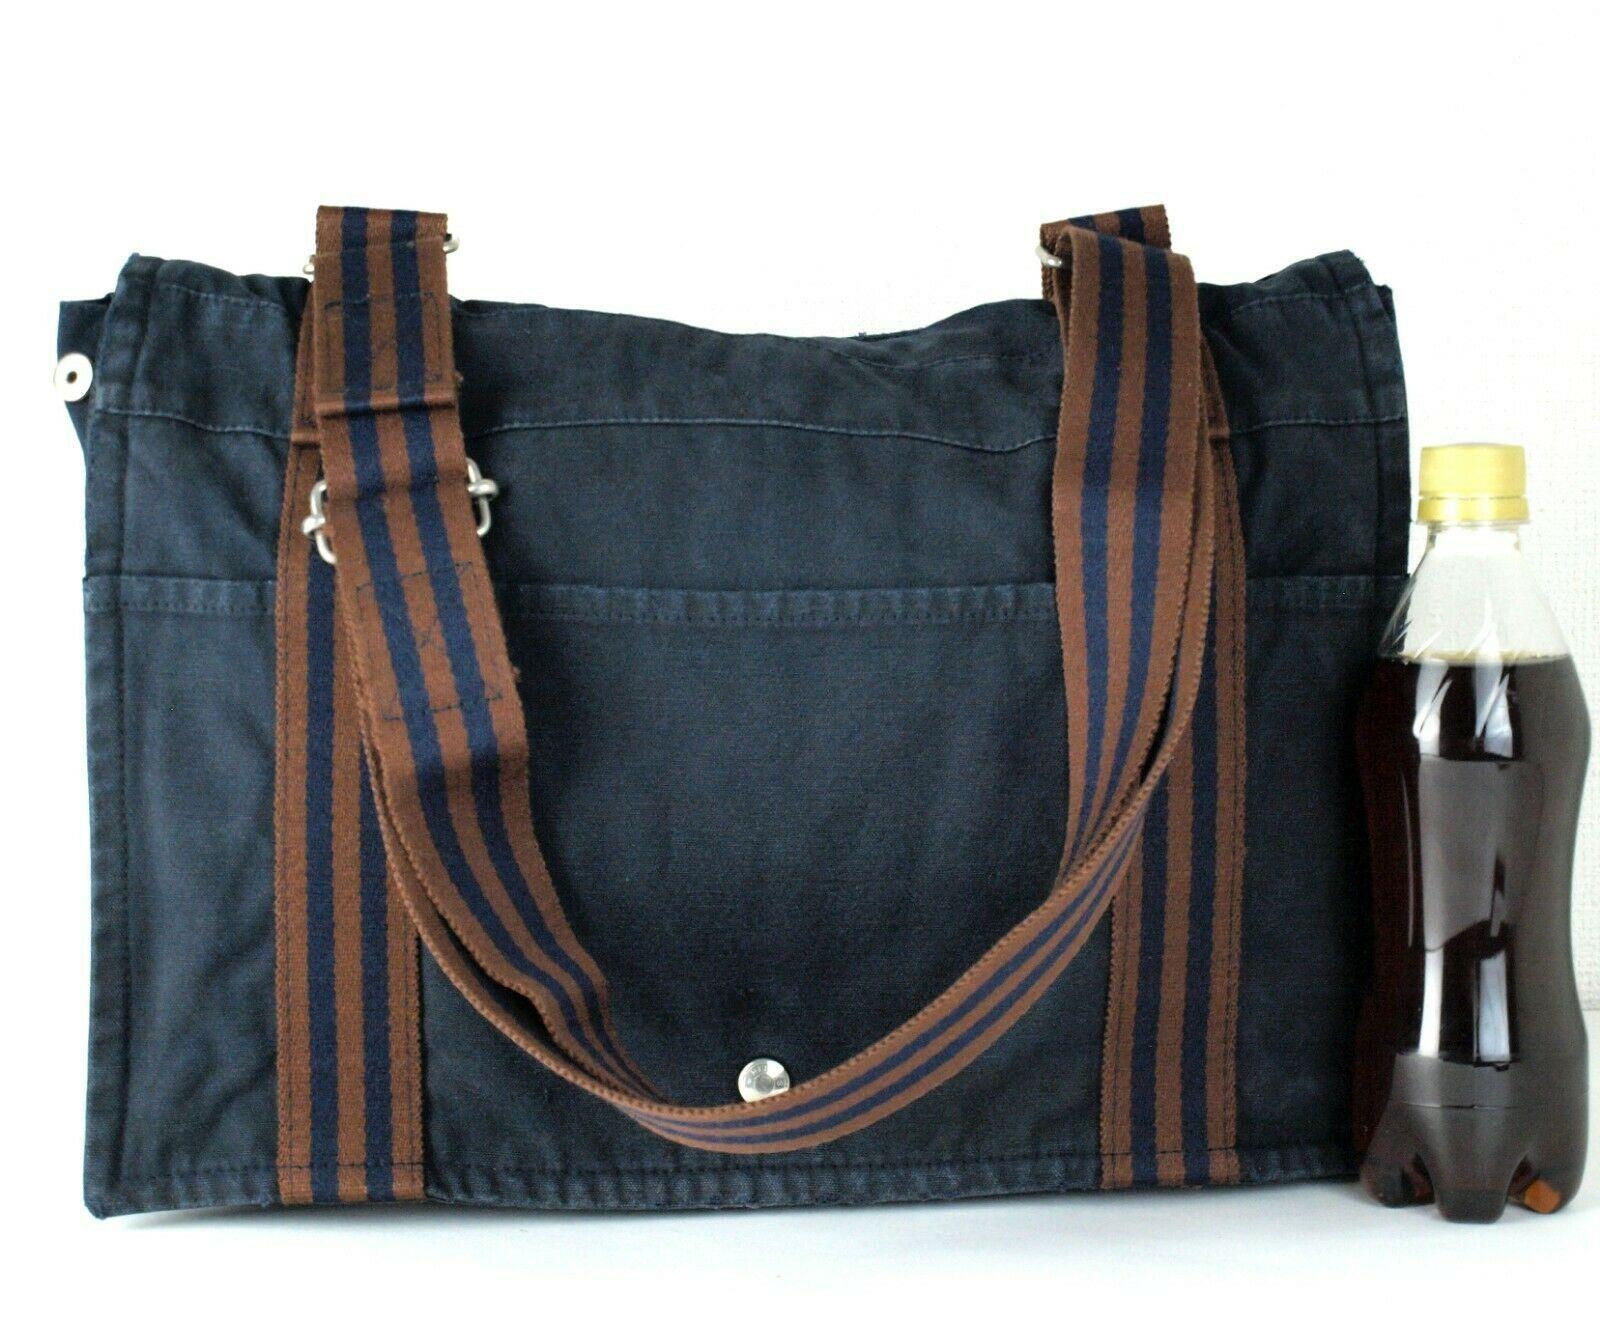 Auth Hermes Fool Toe Vassus MM Navy Cotton Canvas Shoulder Bag Purse France Used image 3